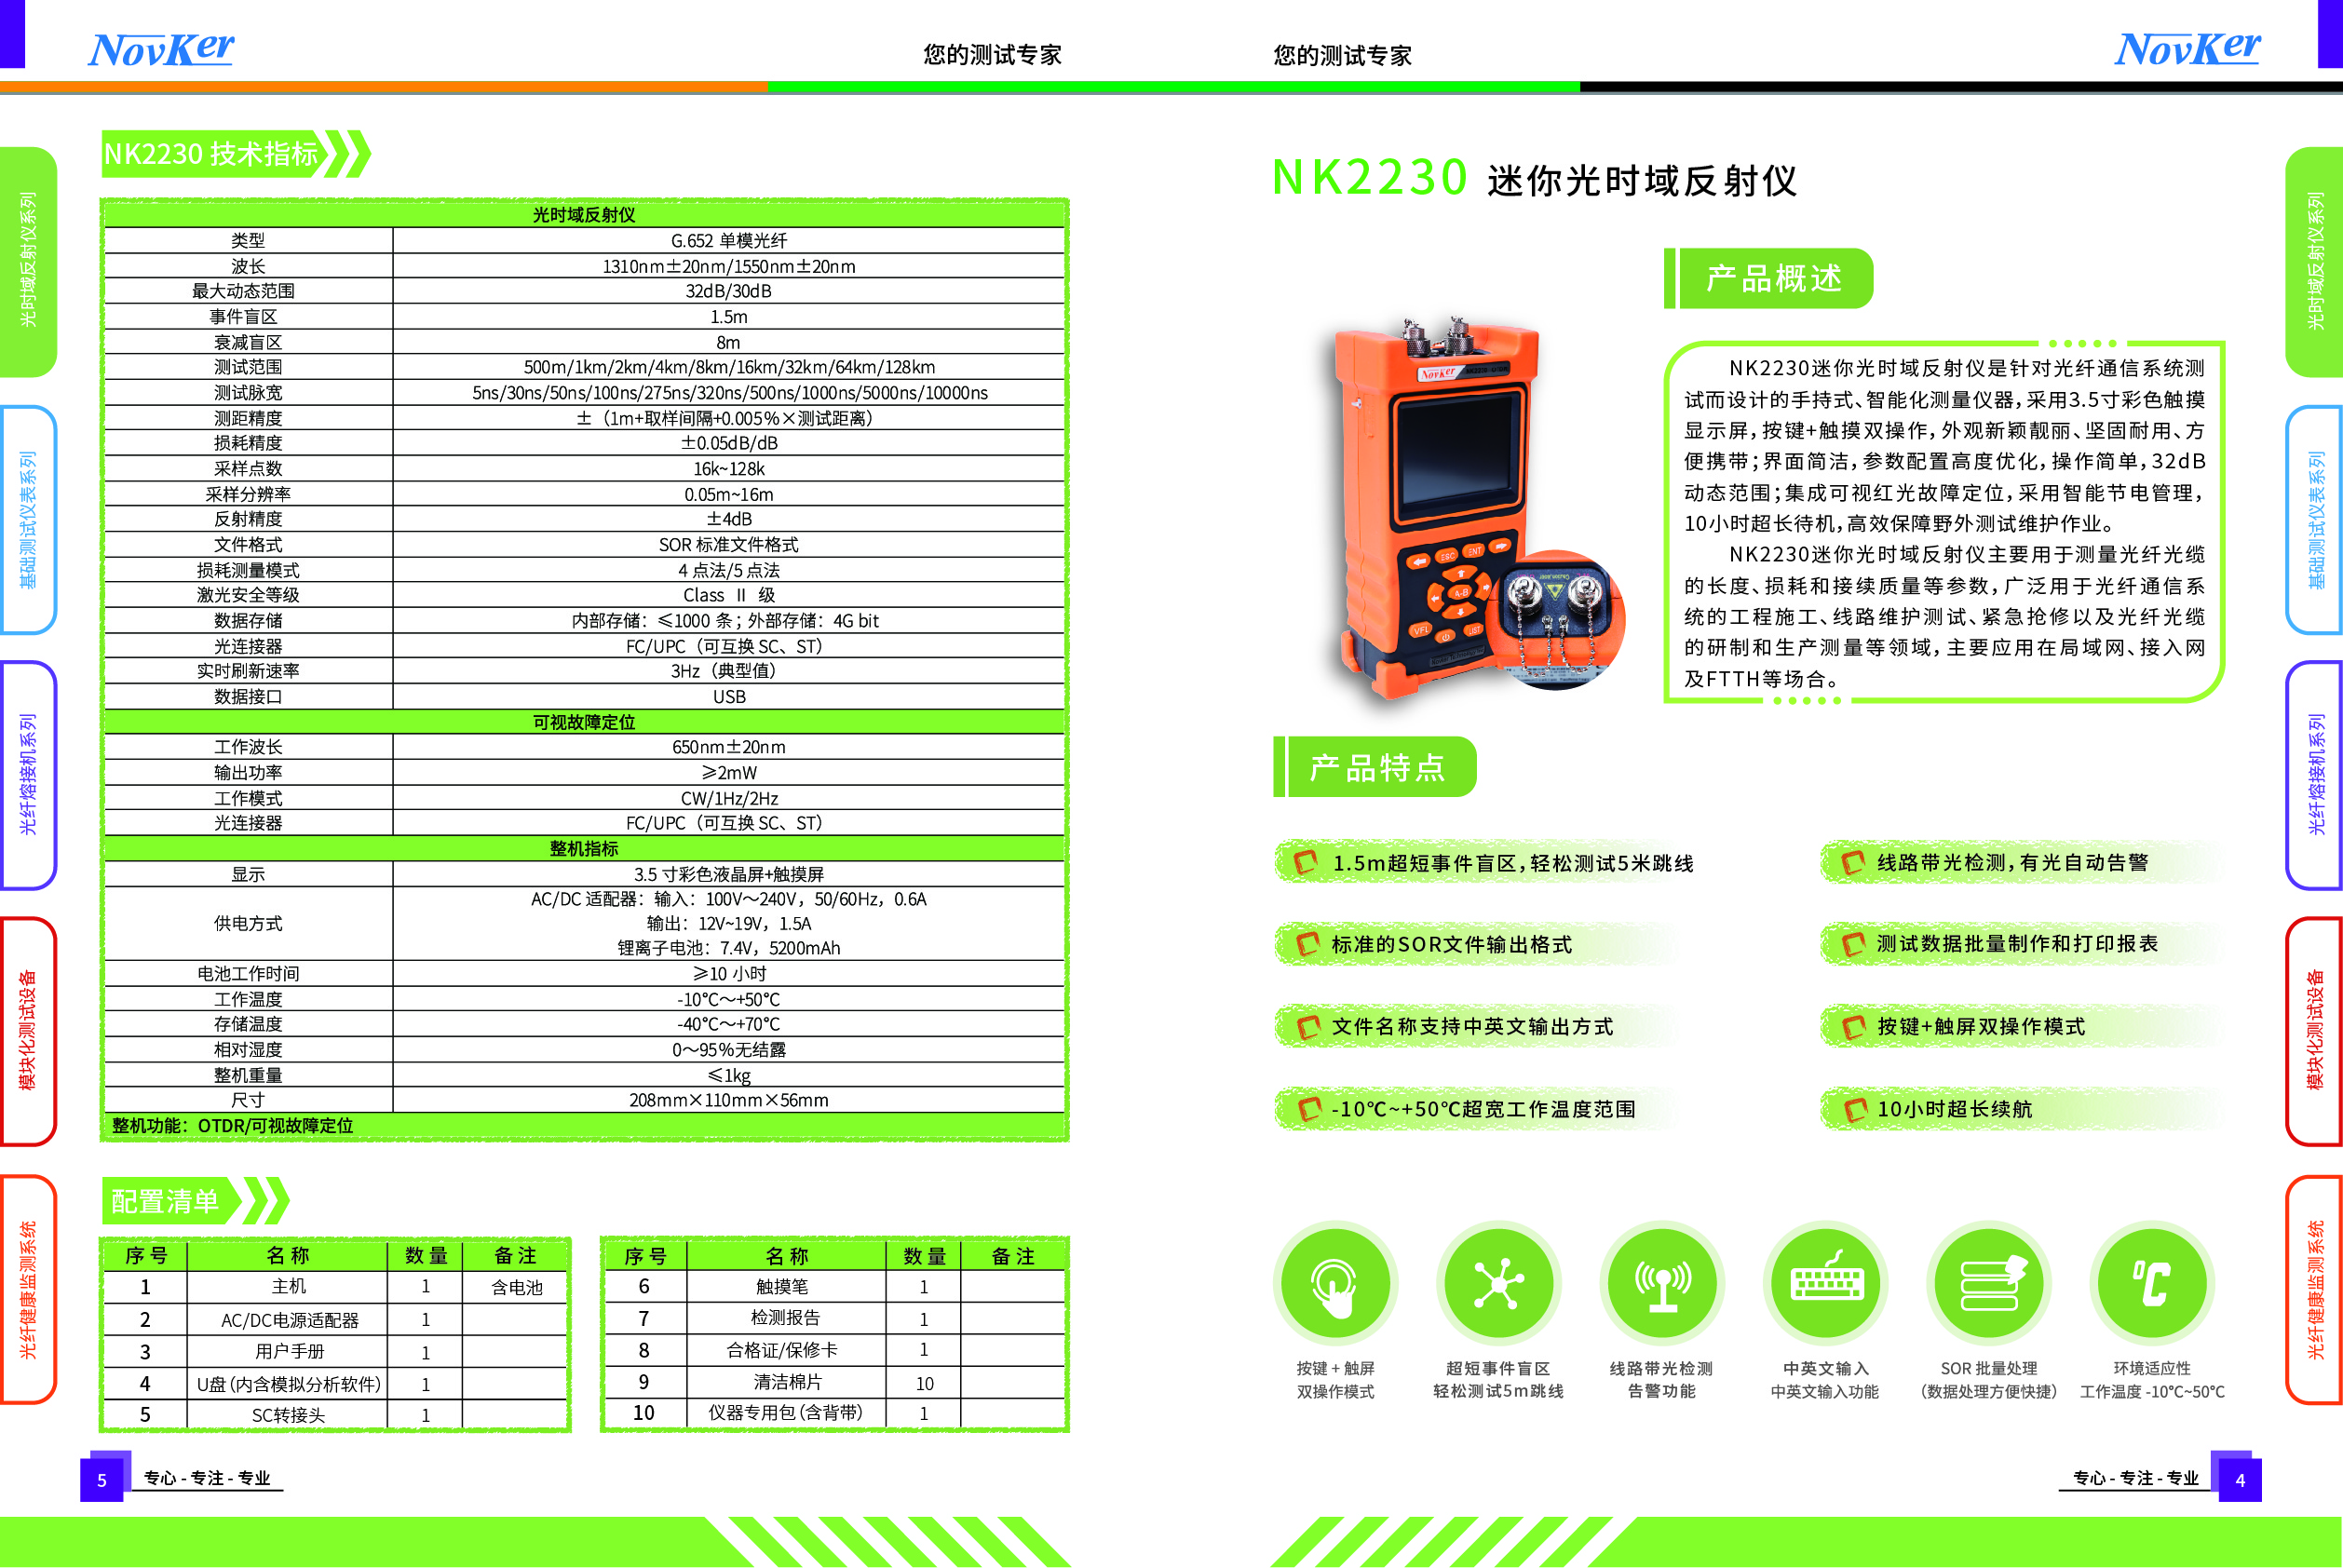 NK2230光章鱼直播看nba反射仪---中文-01.jpg